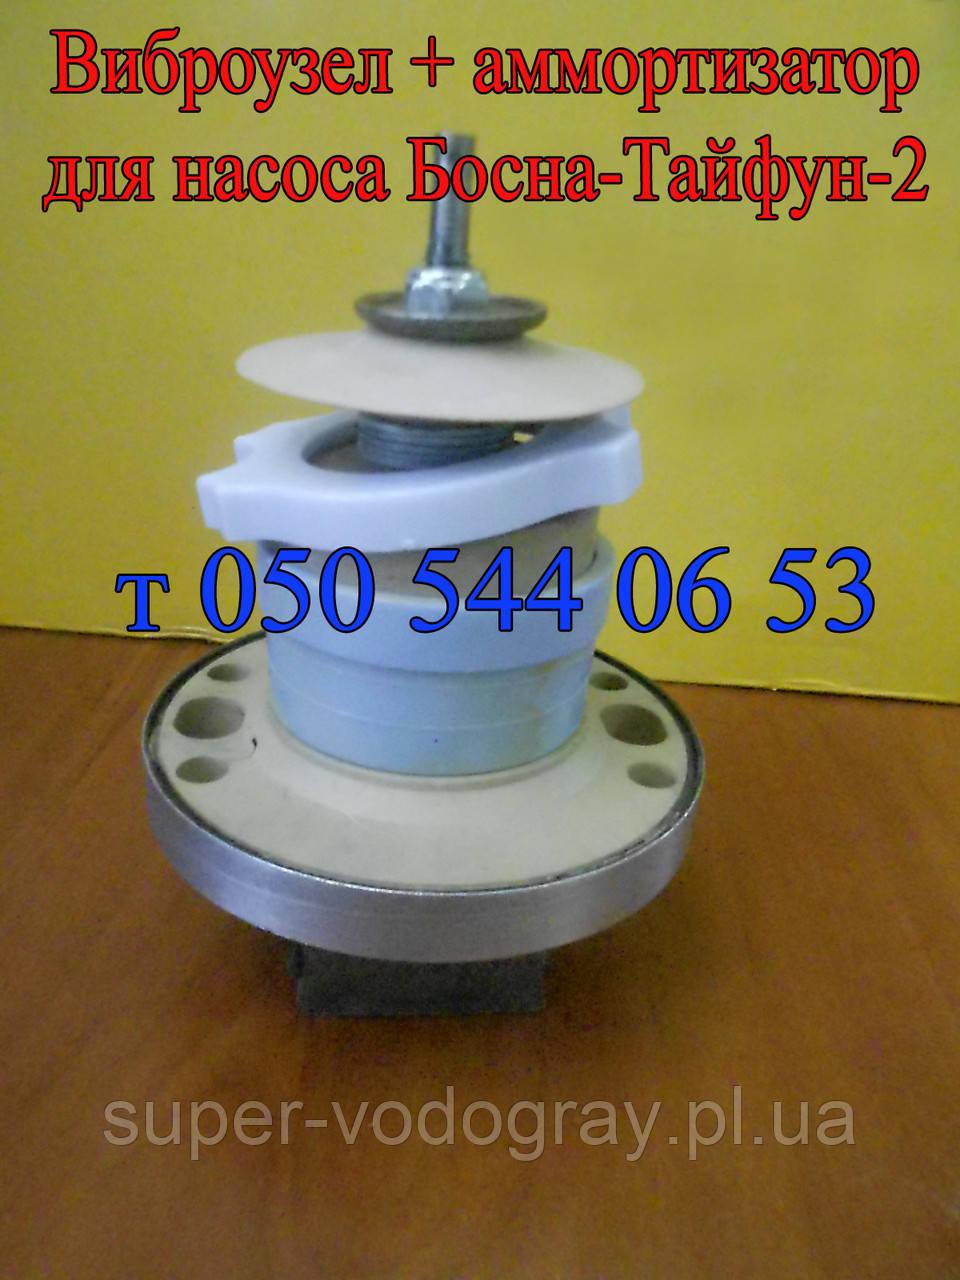 Виброузел + аммортизатор для насоса Босна-Тайфун-2